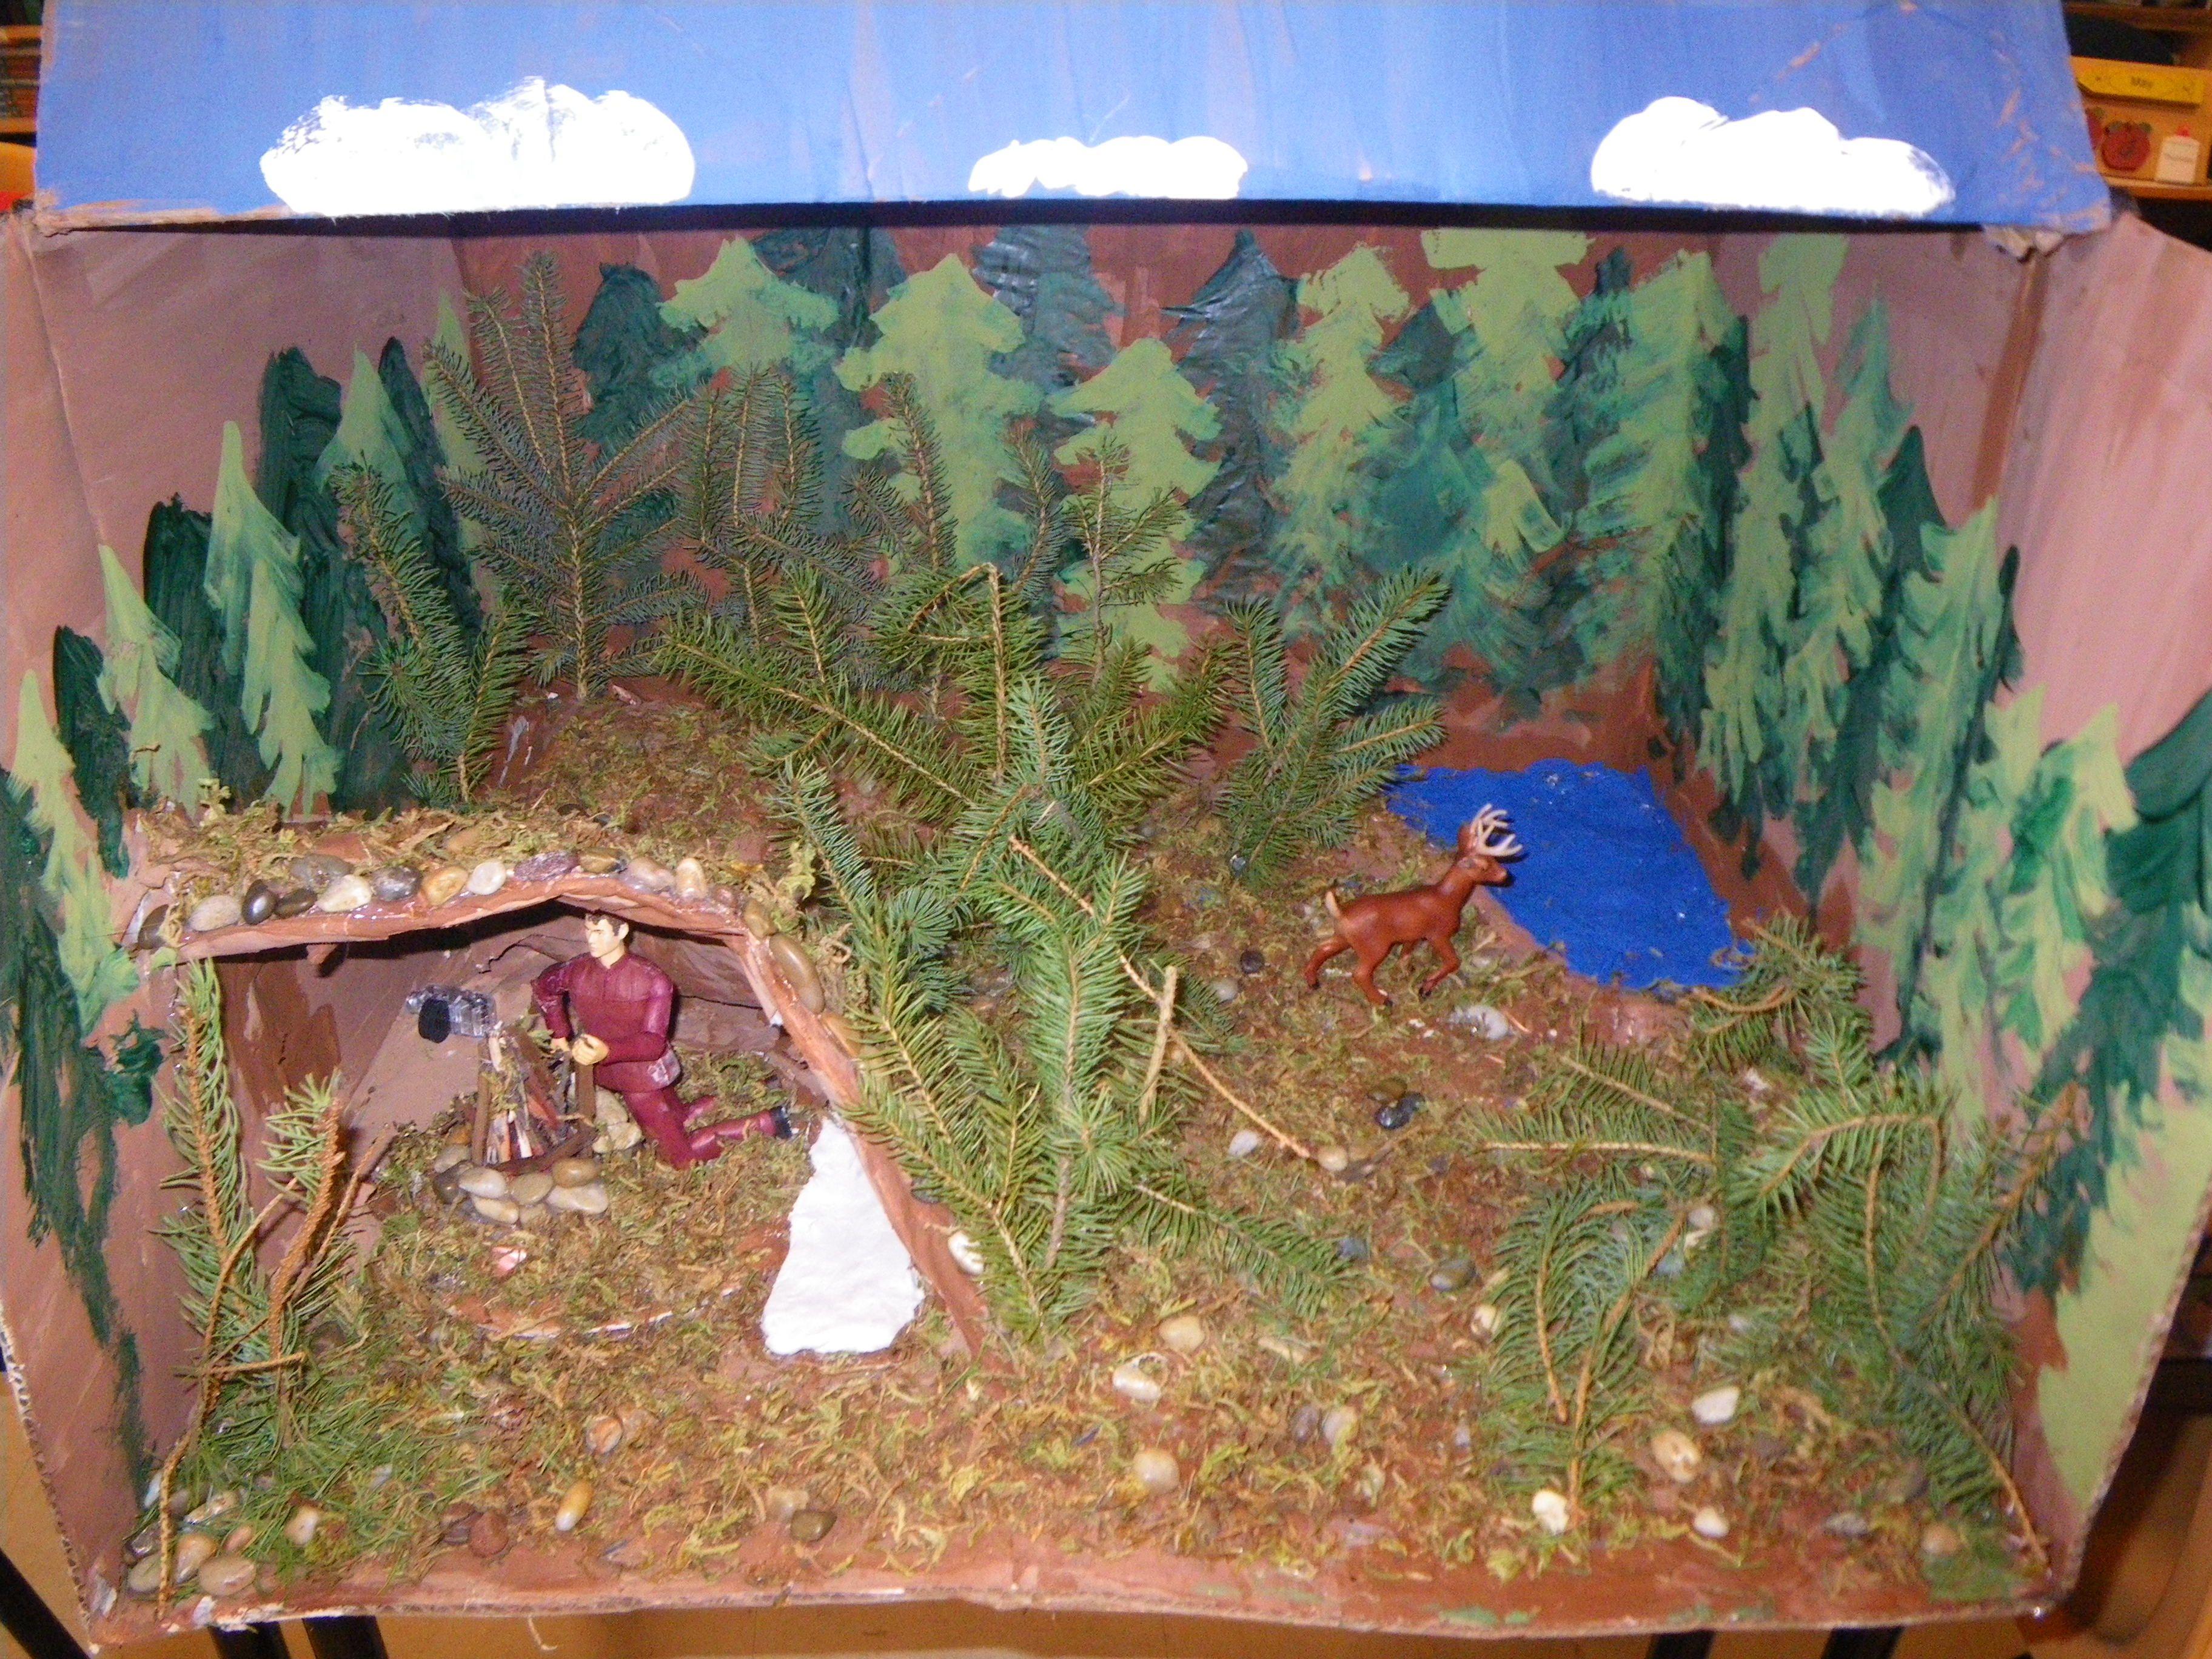 Hatchet Book Cover Ideas : Hatchet diorama teaching literature projects